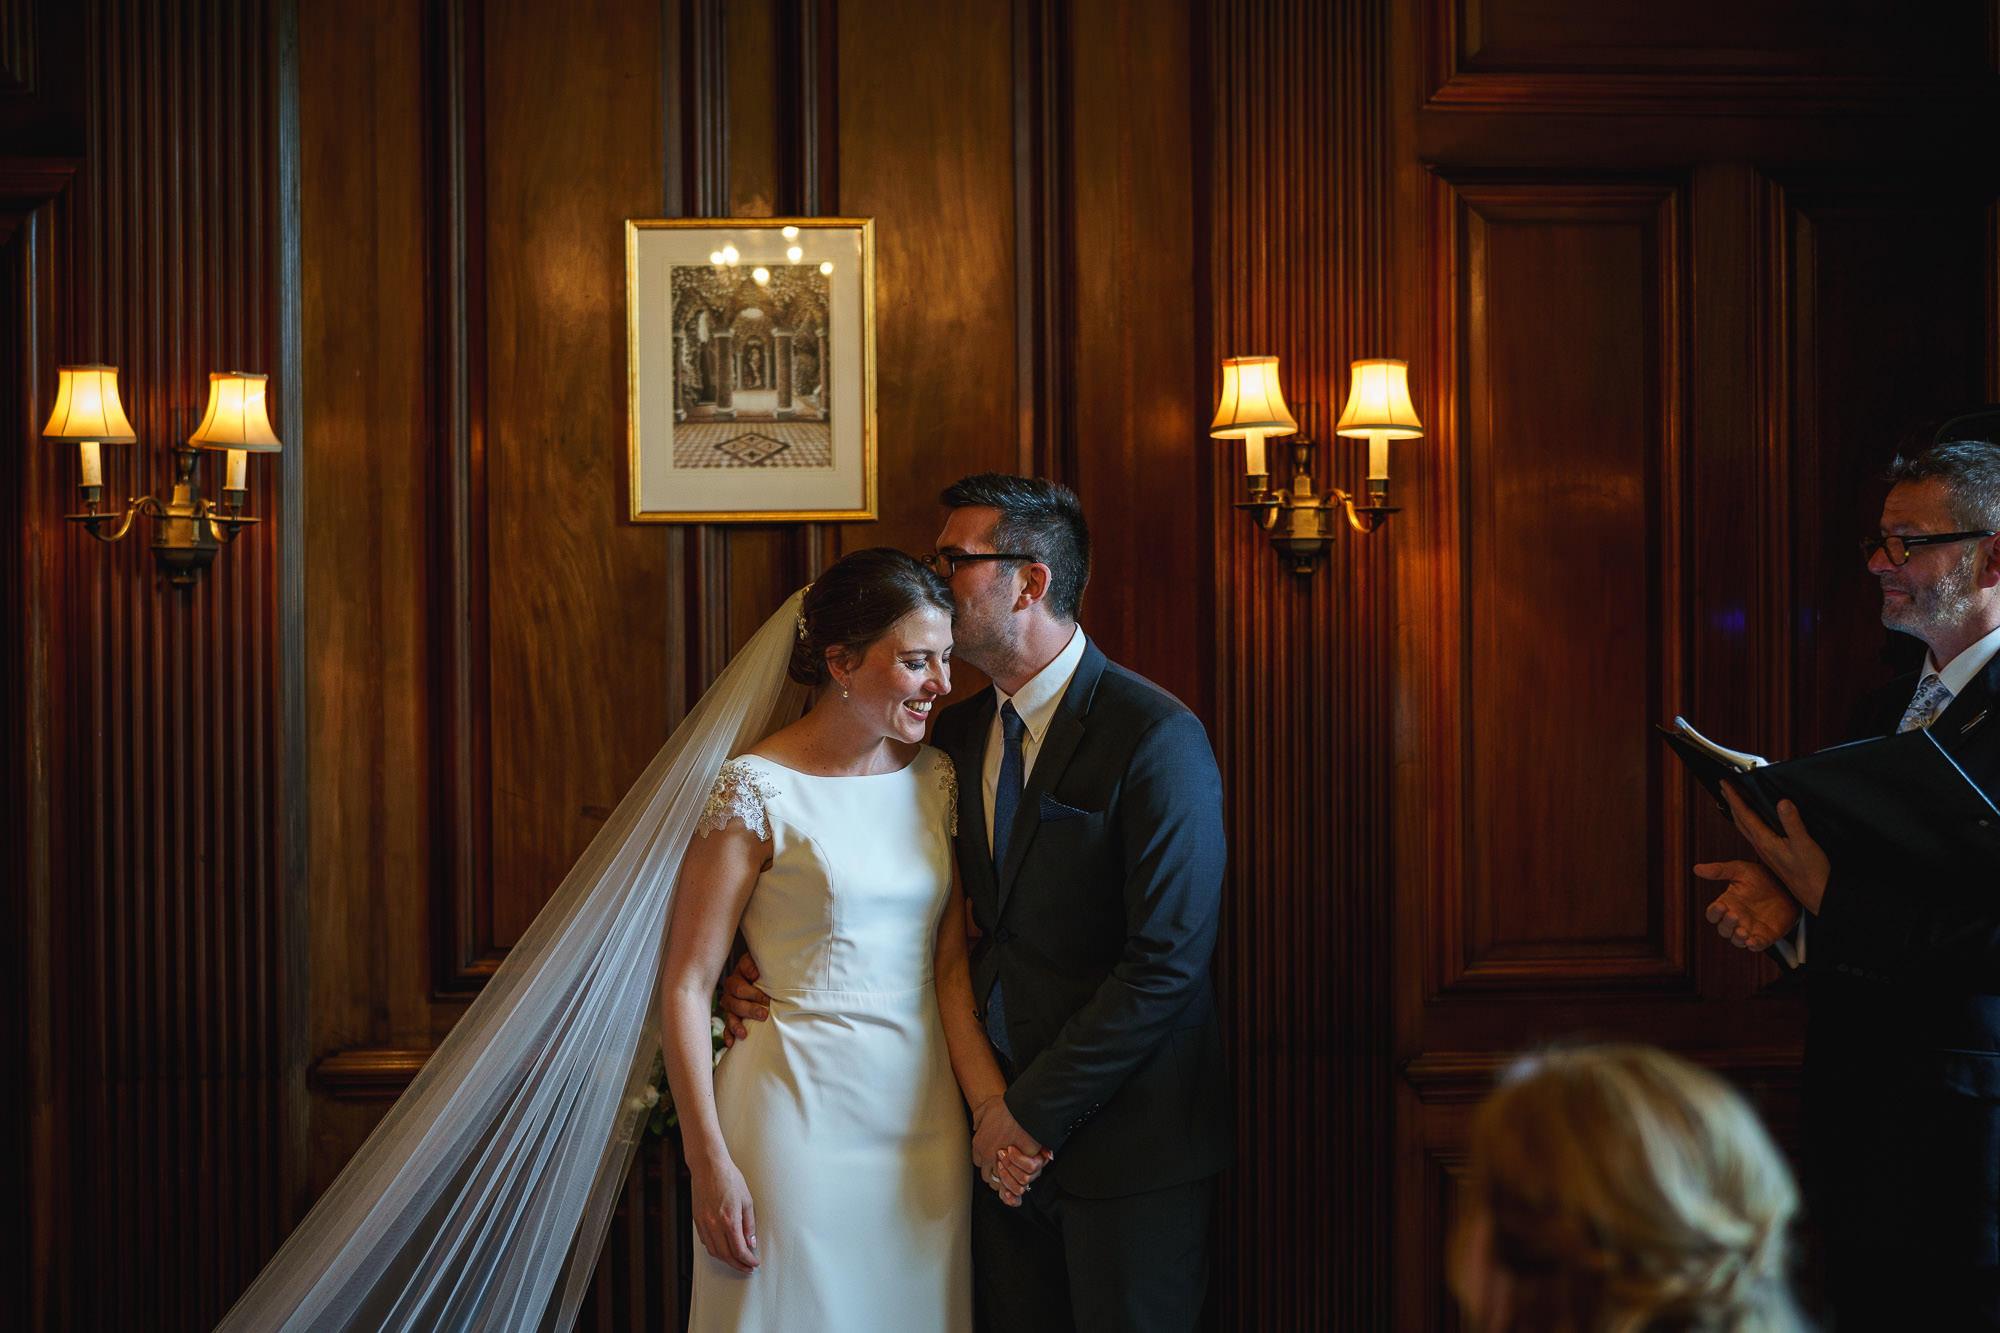 Bristol wedding photography - Chantelle + Nick